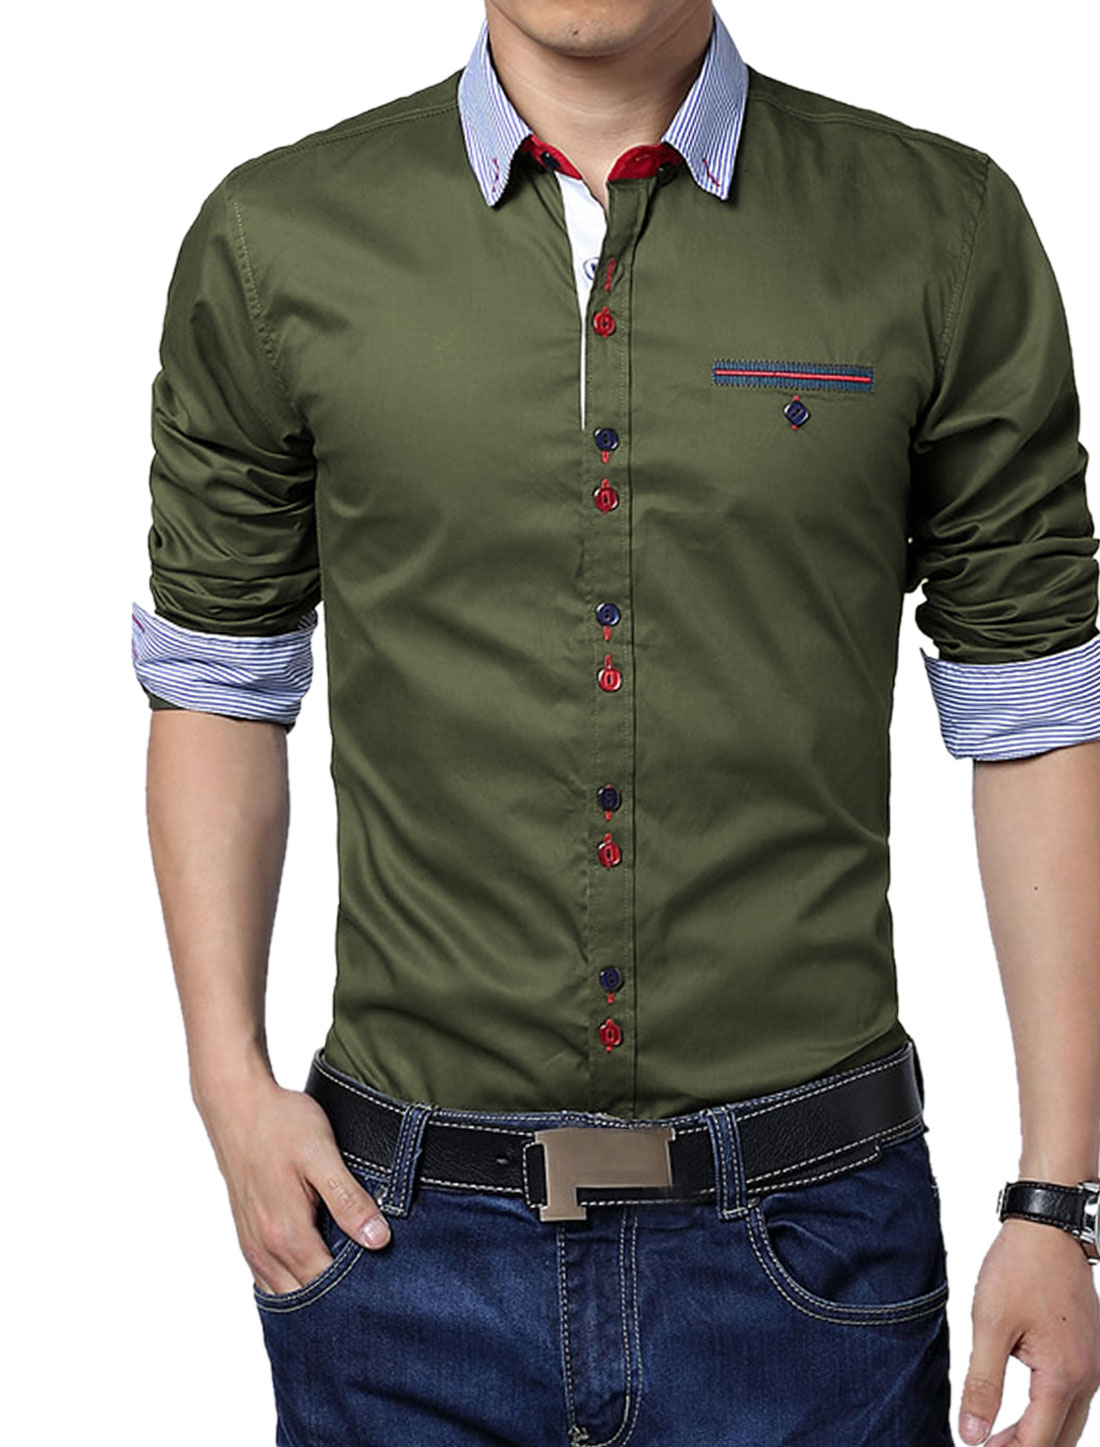 Men Stripes Pattern Panel Design NEW Trendy Top Shirt Army Green L